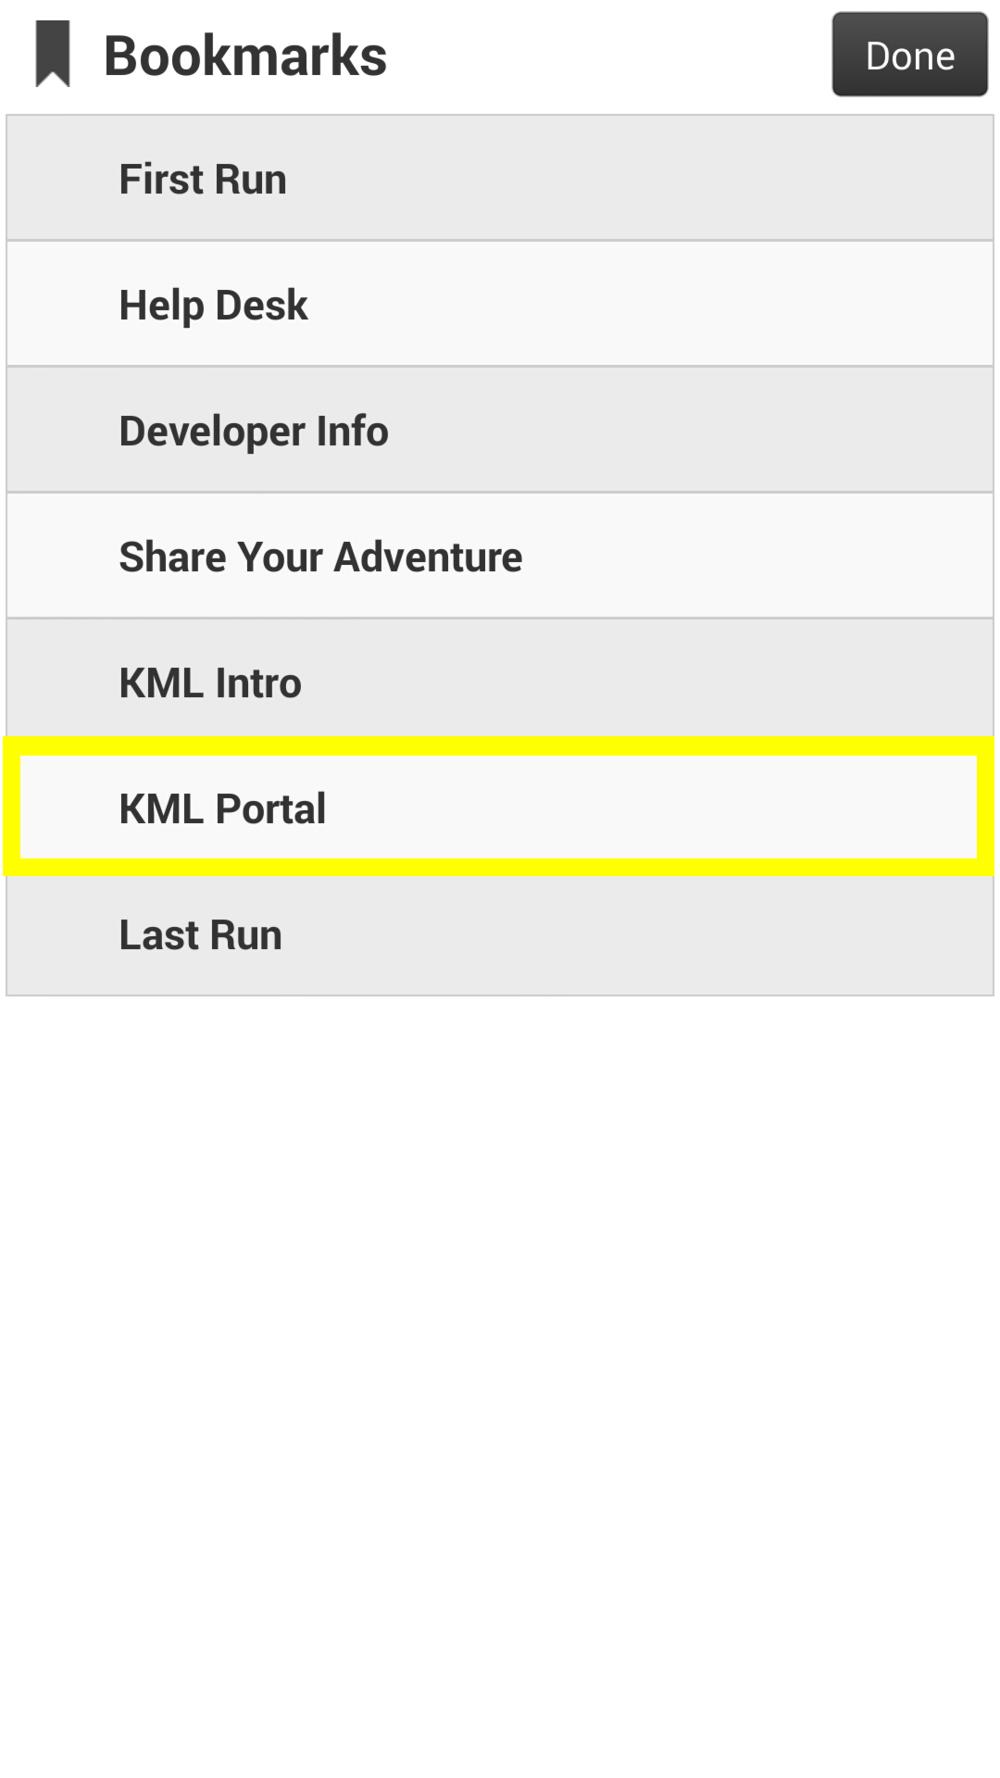 Image 4: In Bookmarks, choose 'KML Portal'.